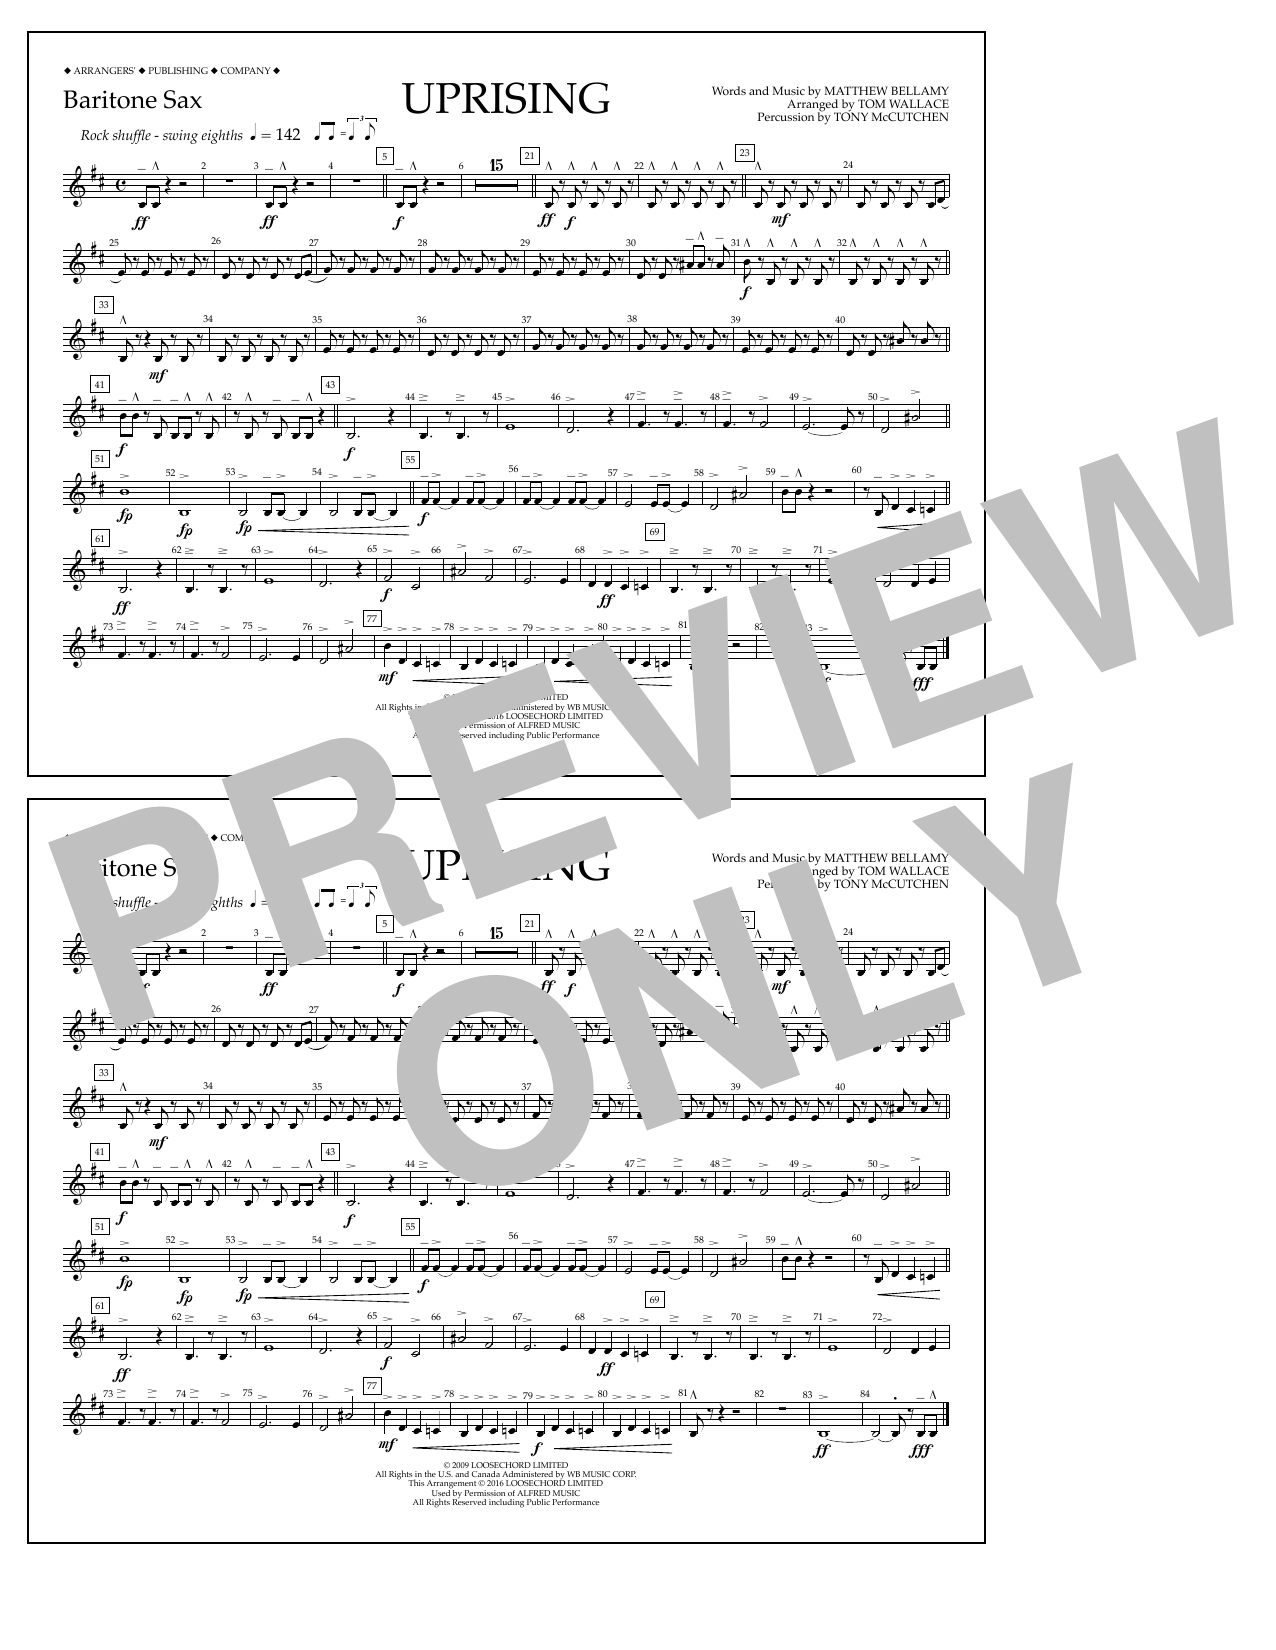 Muse - Uprising - Baritone Sax